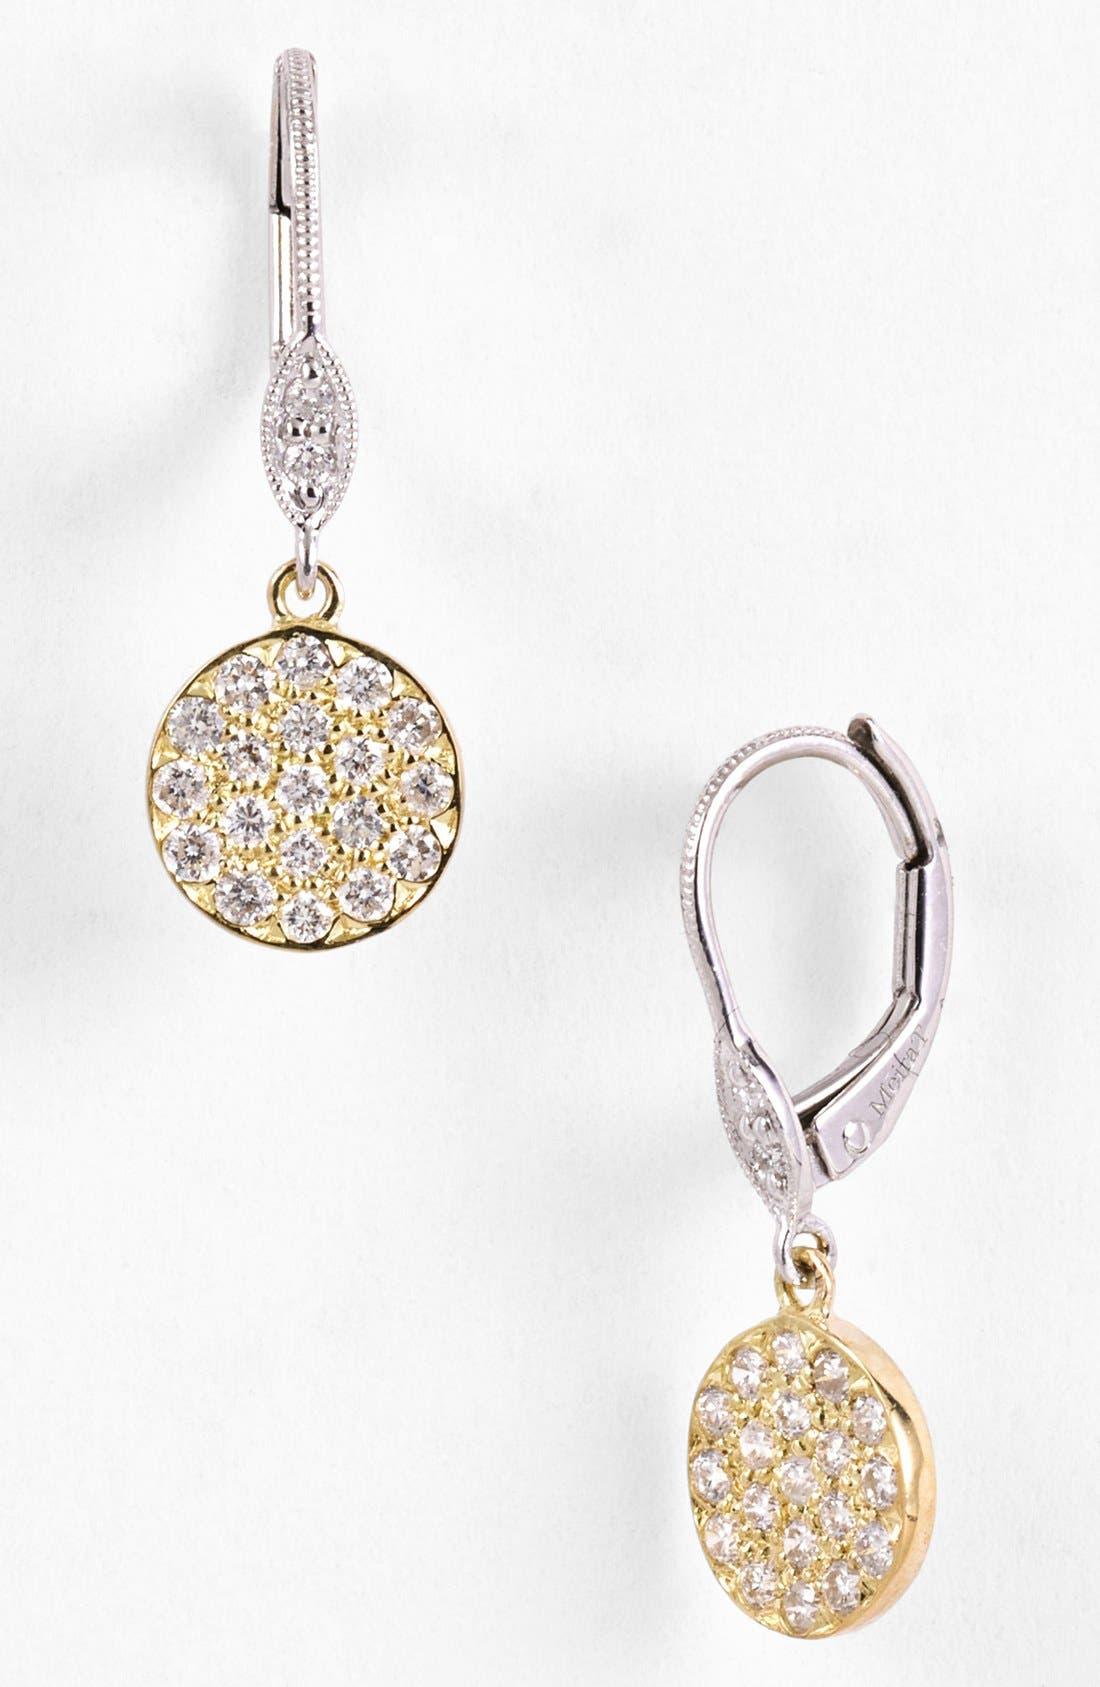 Alternate Image 1 Selected - MeiraT 'Dazzling' Diamond Disc Drop Earrings